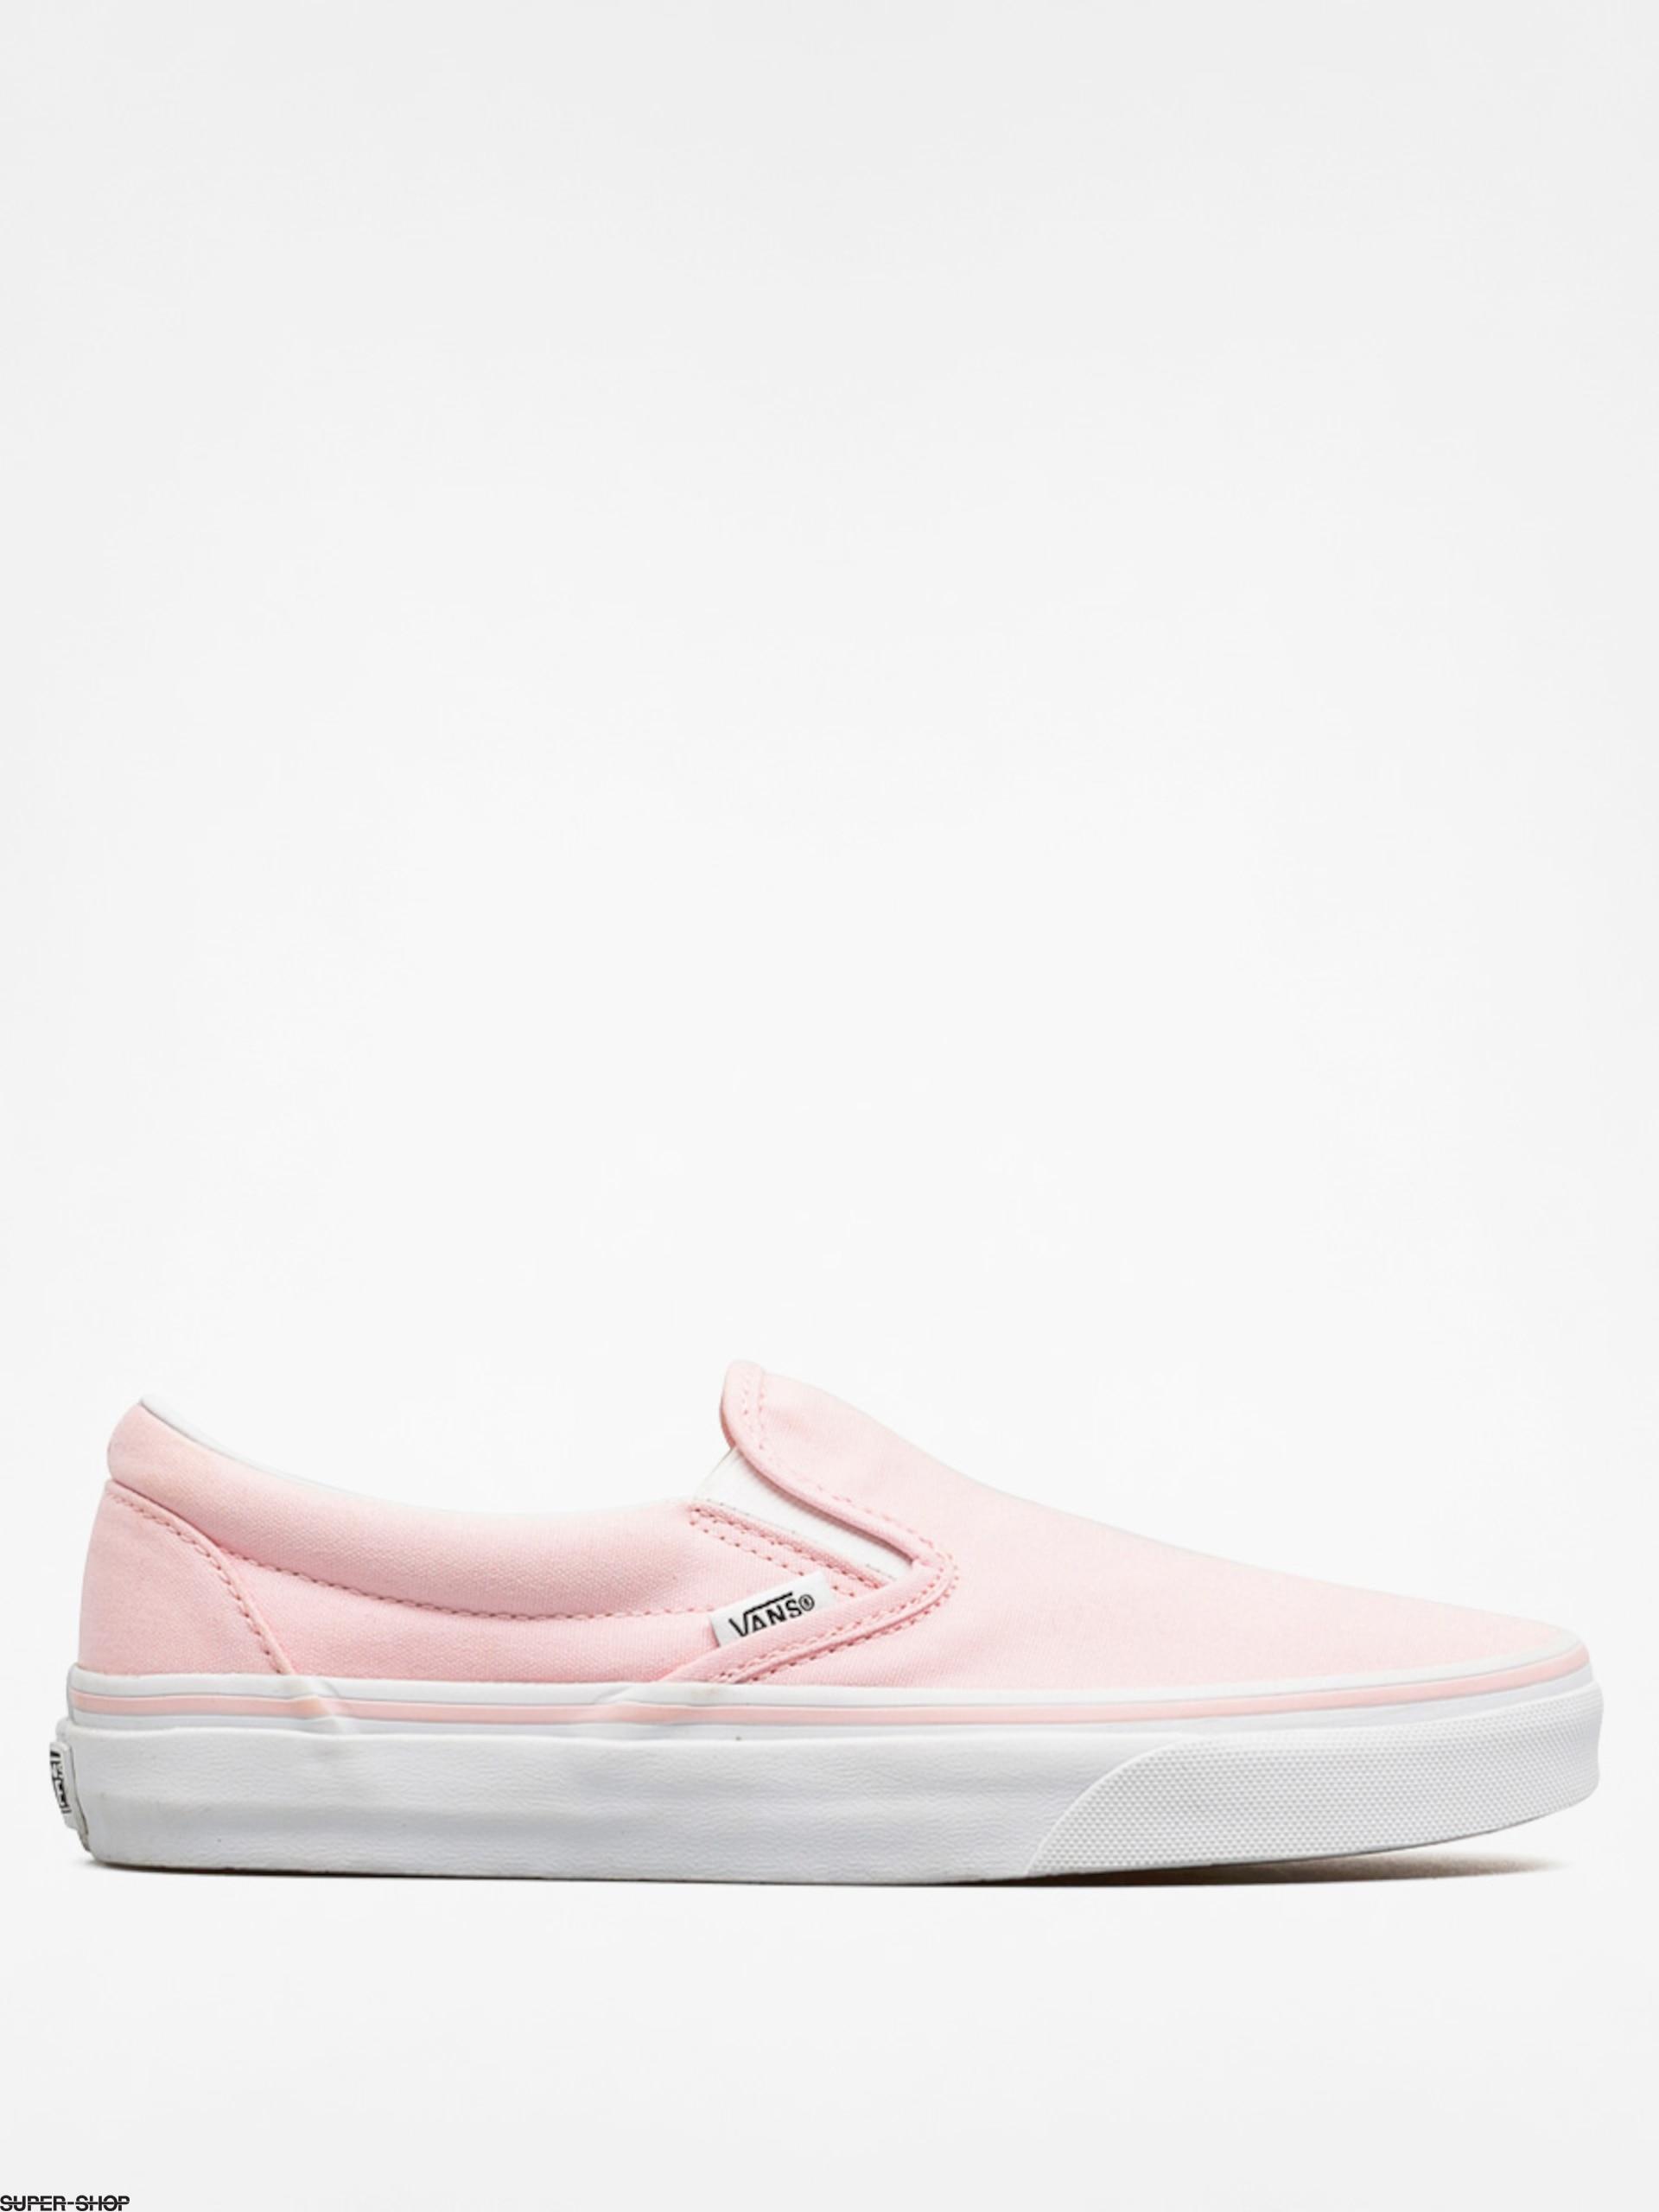 Vans Shoes CLassic Slip On (ballerina true white) 19b61af25